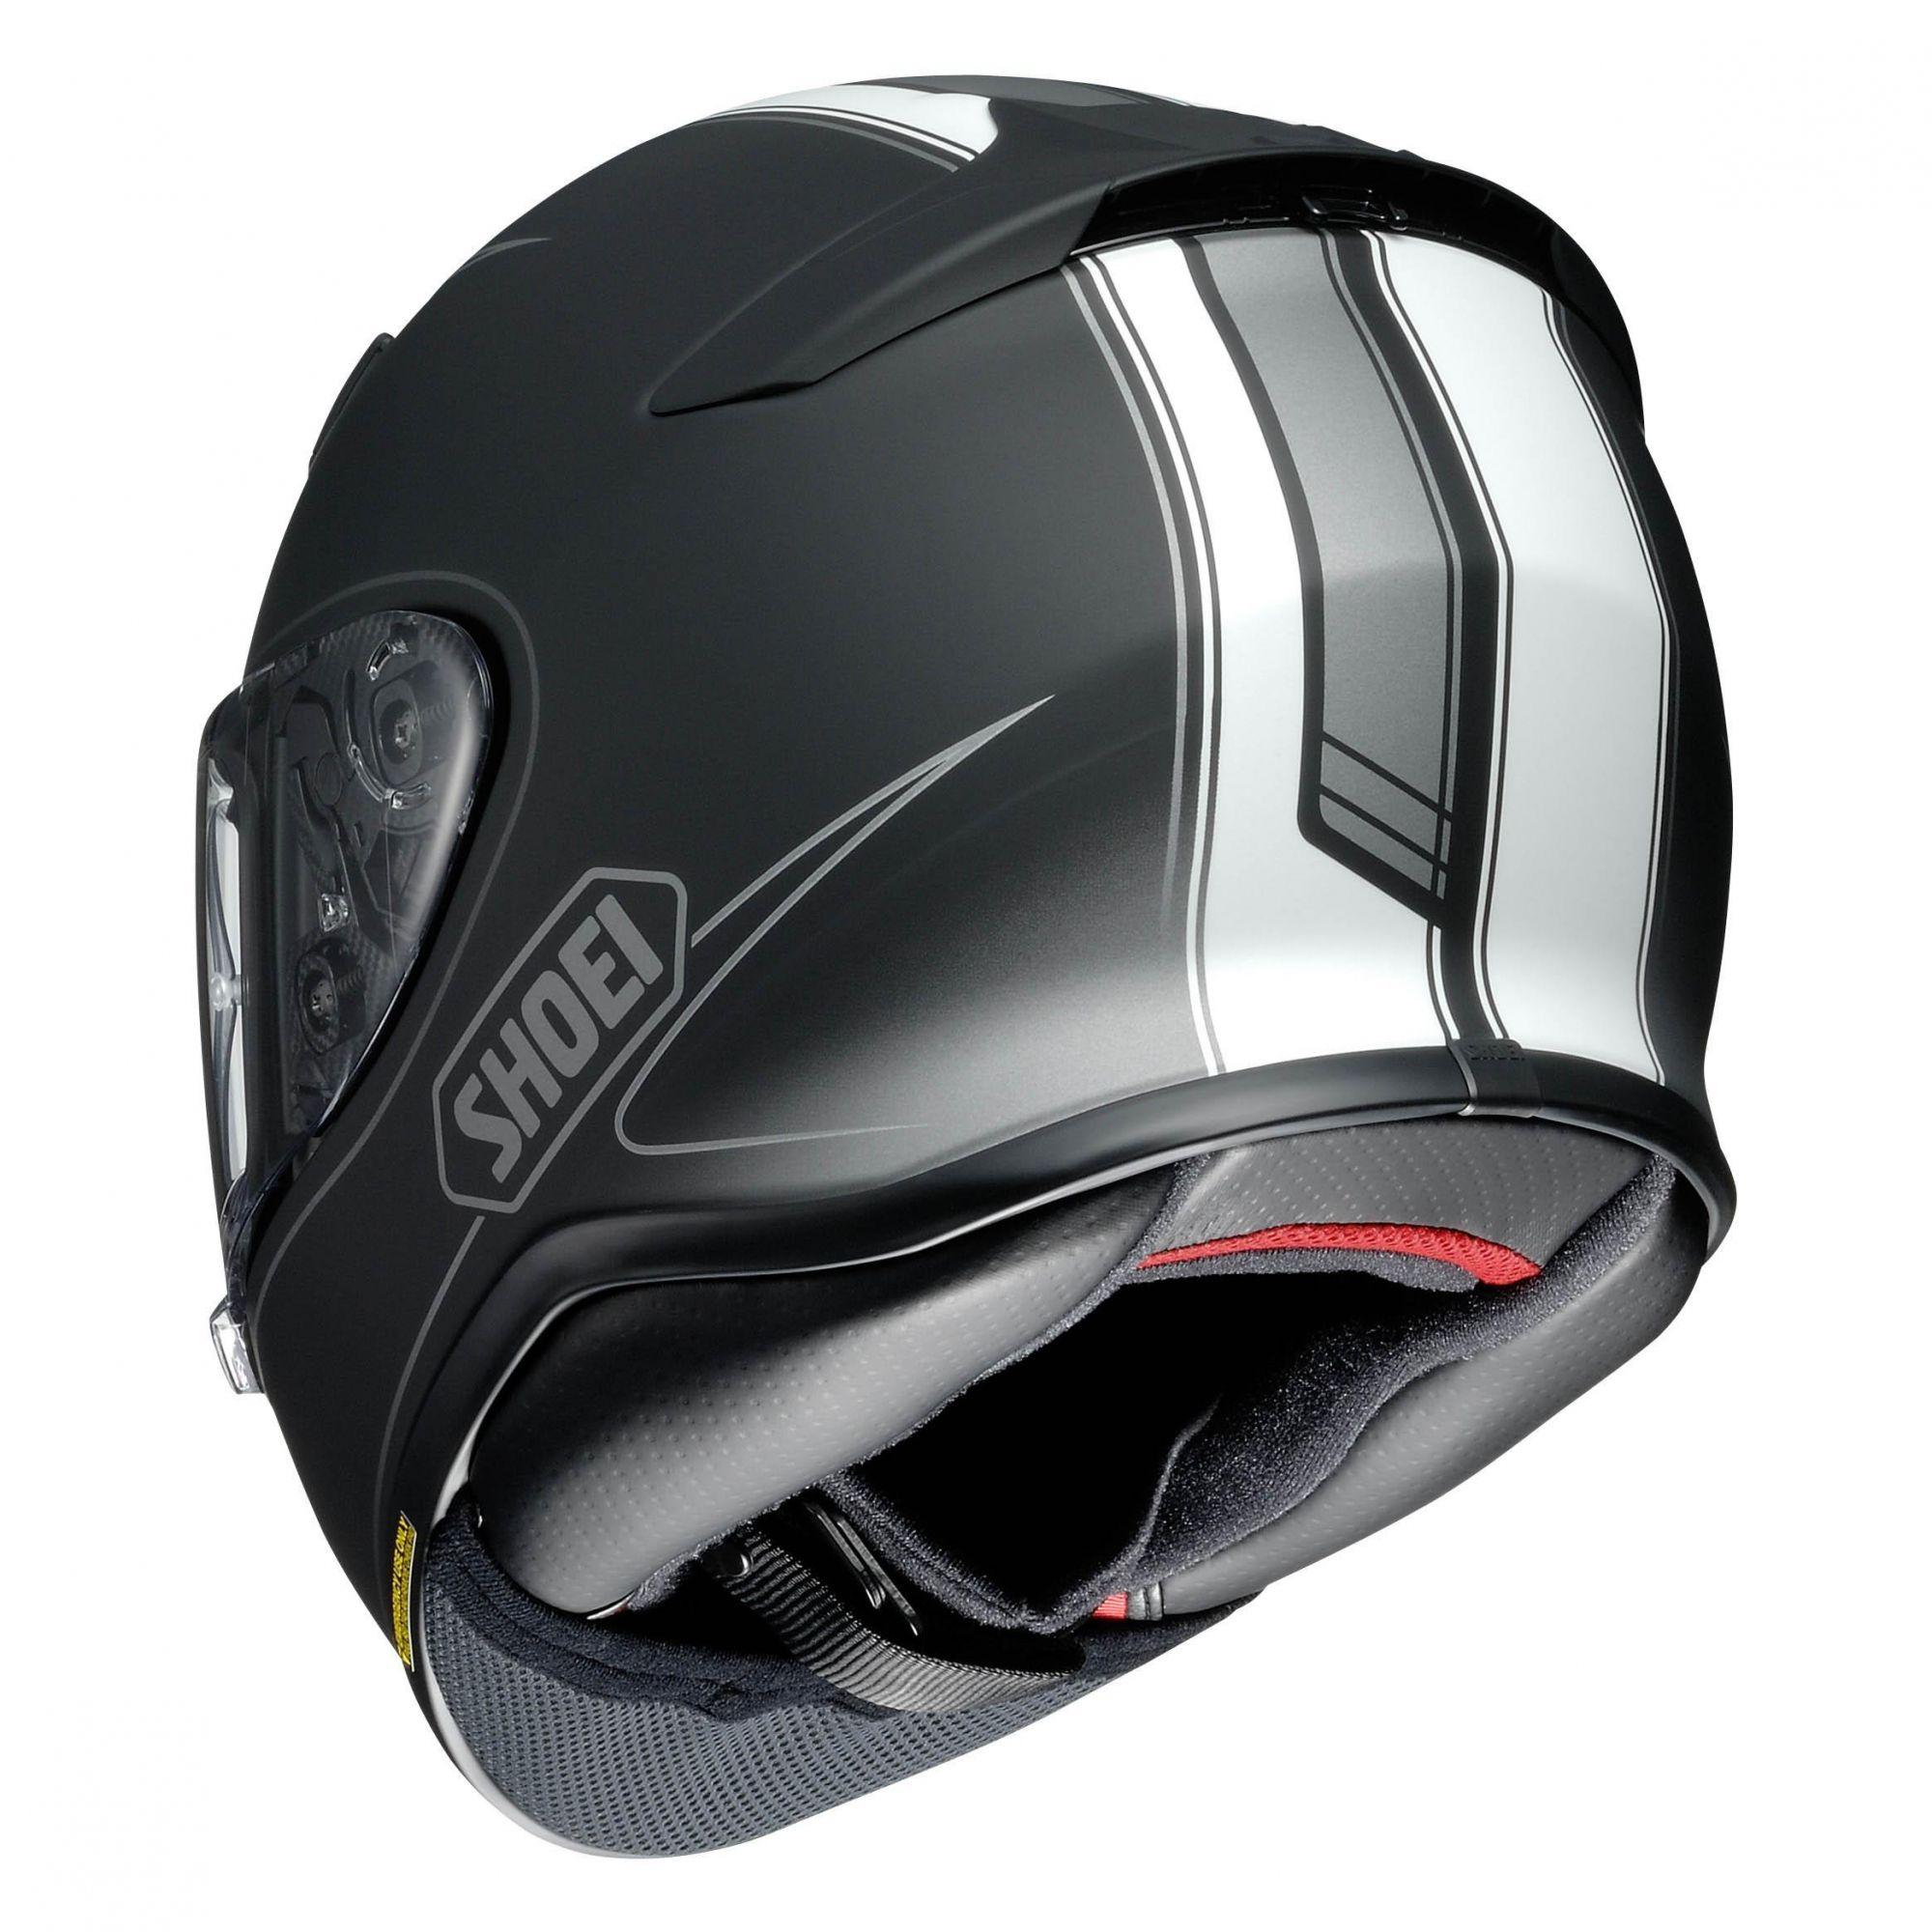 Capacete Shoei NXR Flagger TC-5 Preto/Branco  - Nova Centro Boutique Roupas para Motociclistas